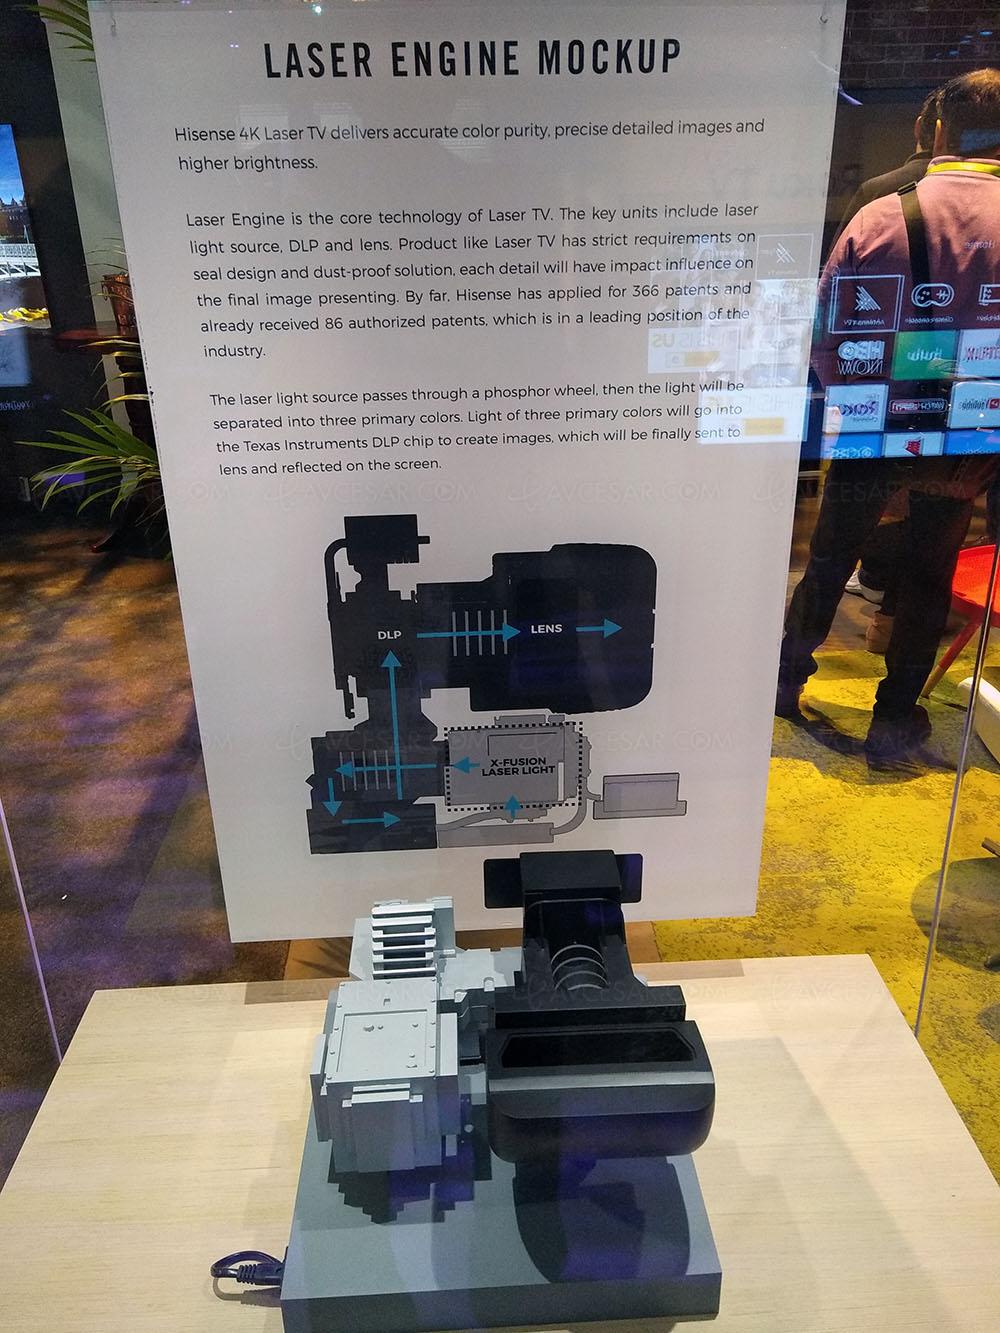 Videoprojecteur Avec Tuner Tv ces 18 > laser tv ultra hd hisense, vidéoprojecteur ultra